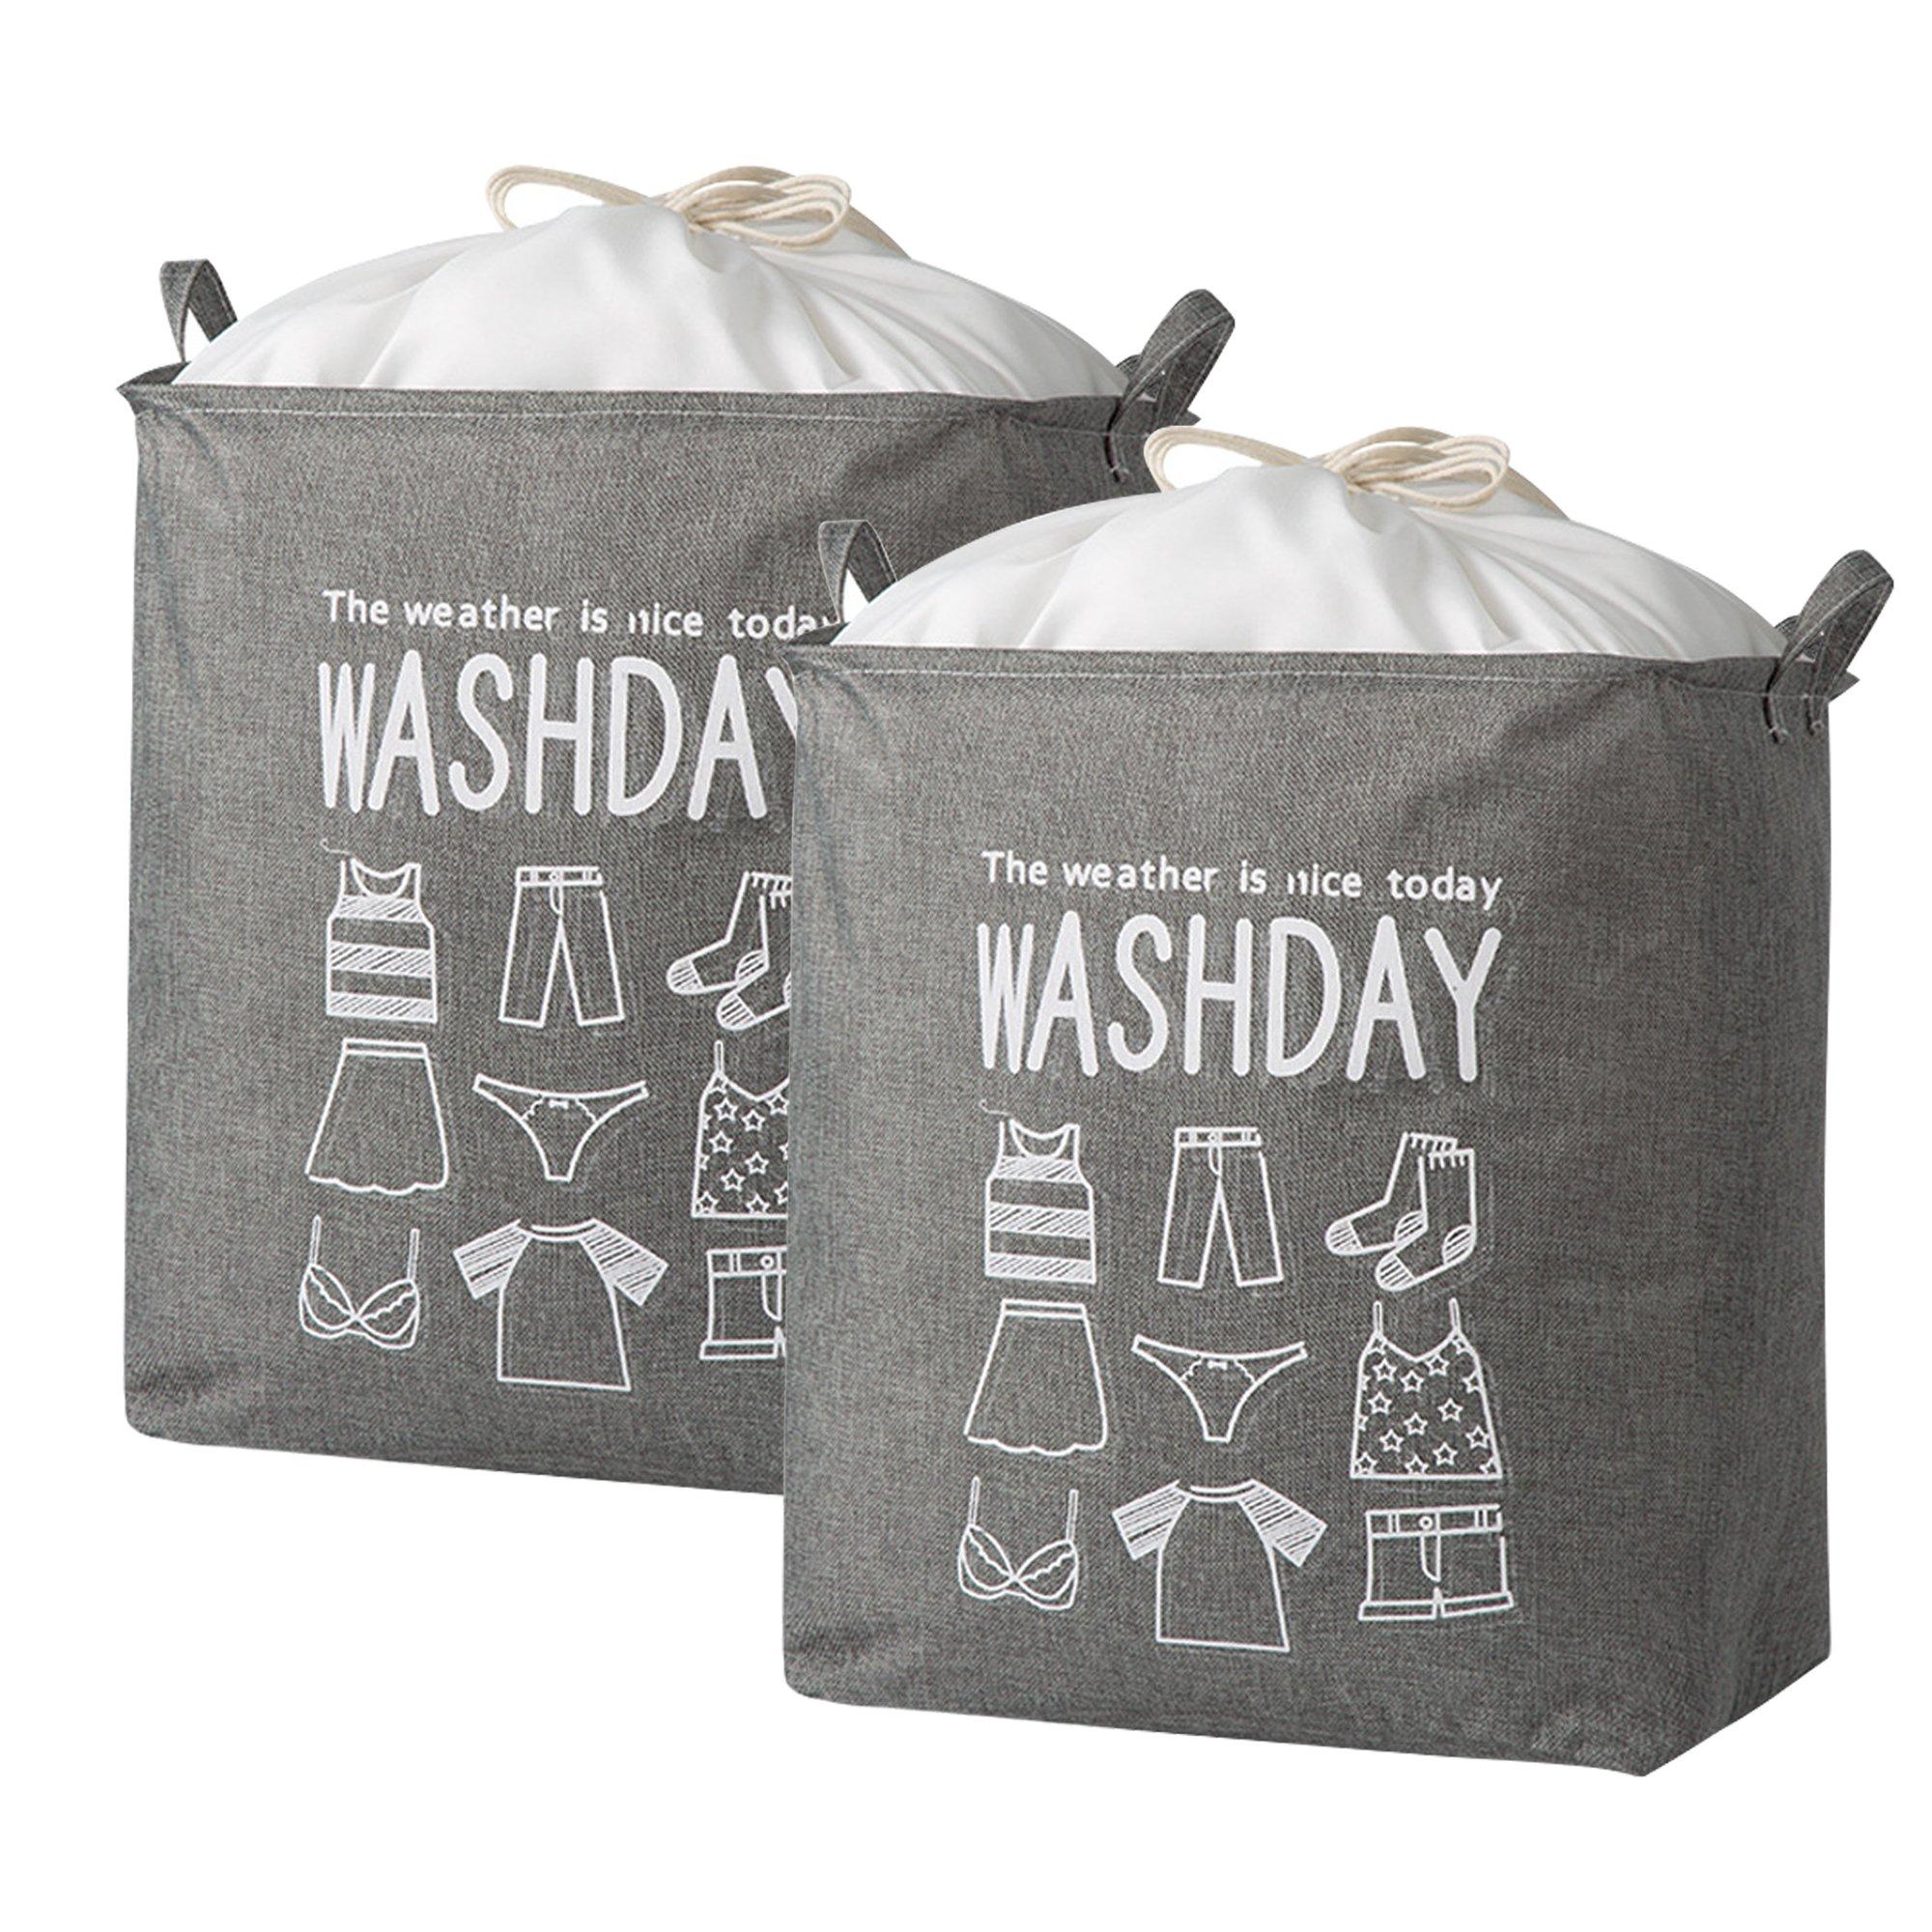 2Pcs Large Collapsible Storage Bag Laundry Hamper